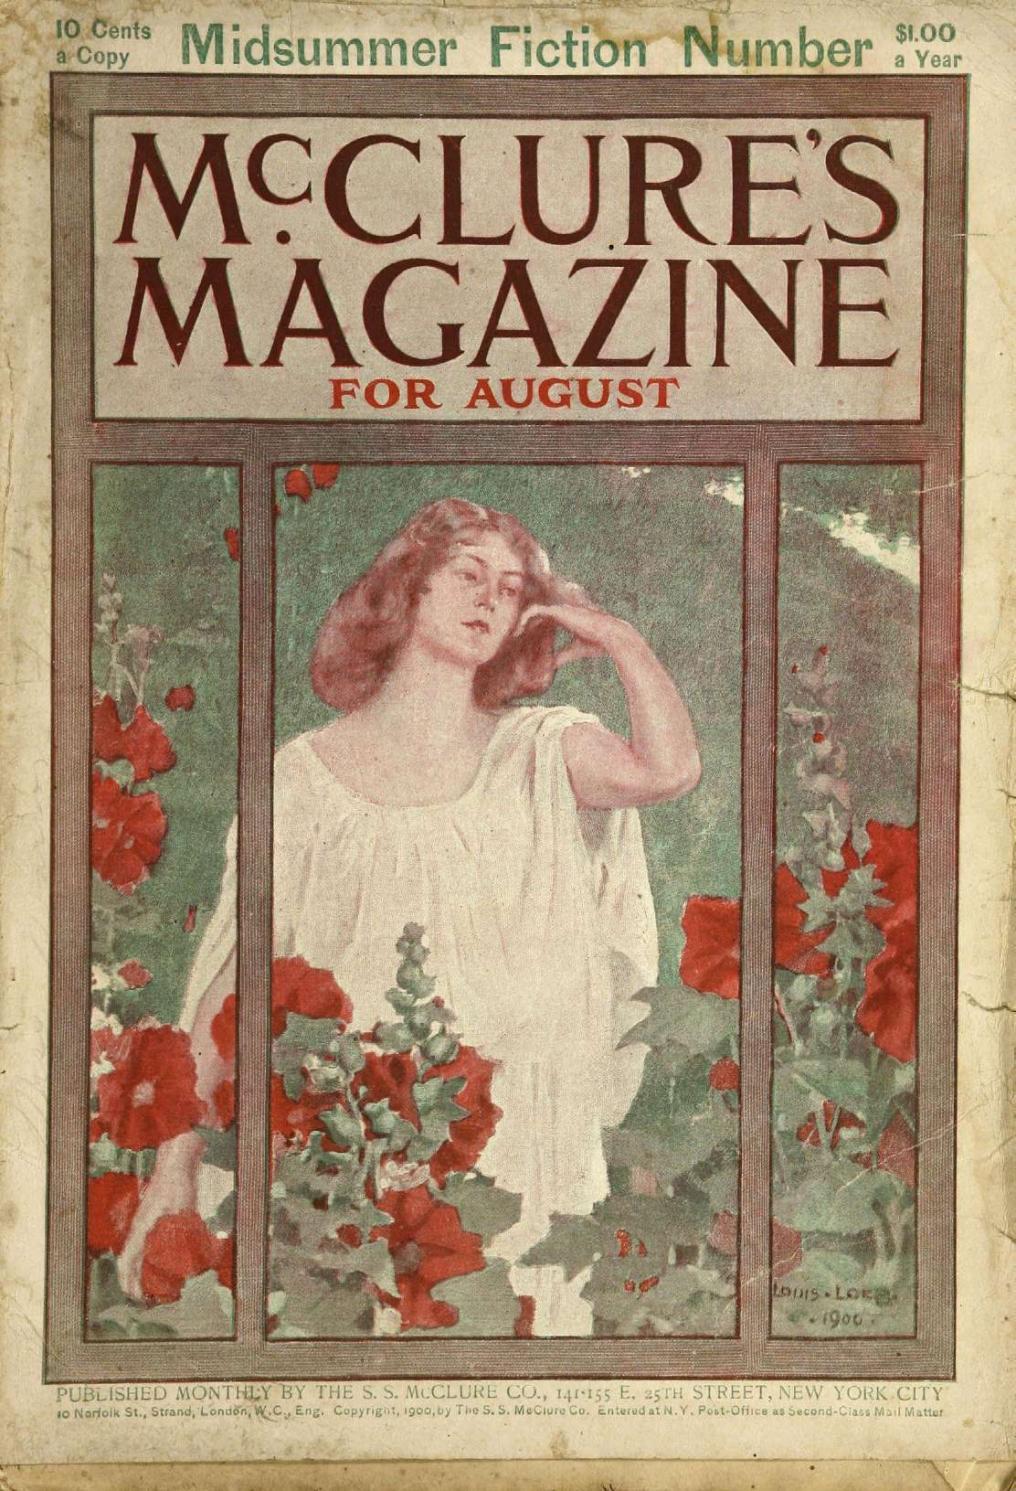 foto de McClure's Magazine 1900-08 vintage by ㅤㅤㅤㅤ - issuu